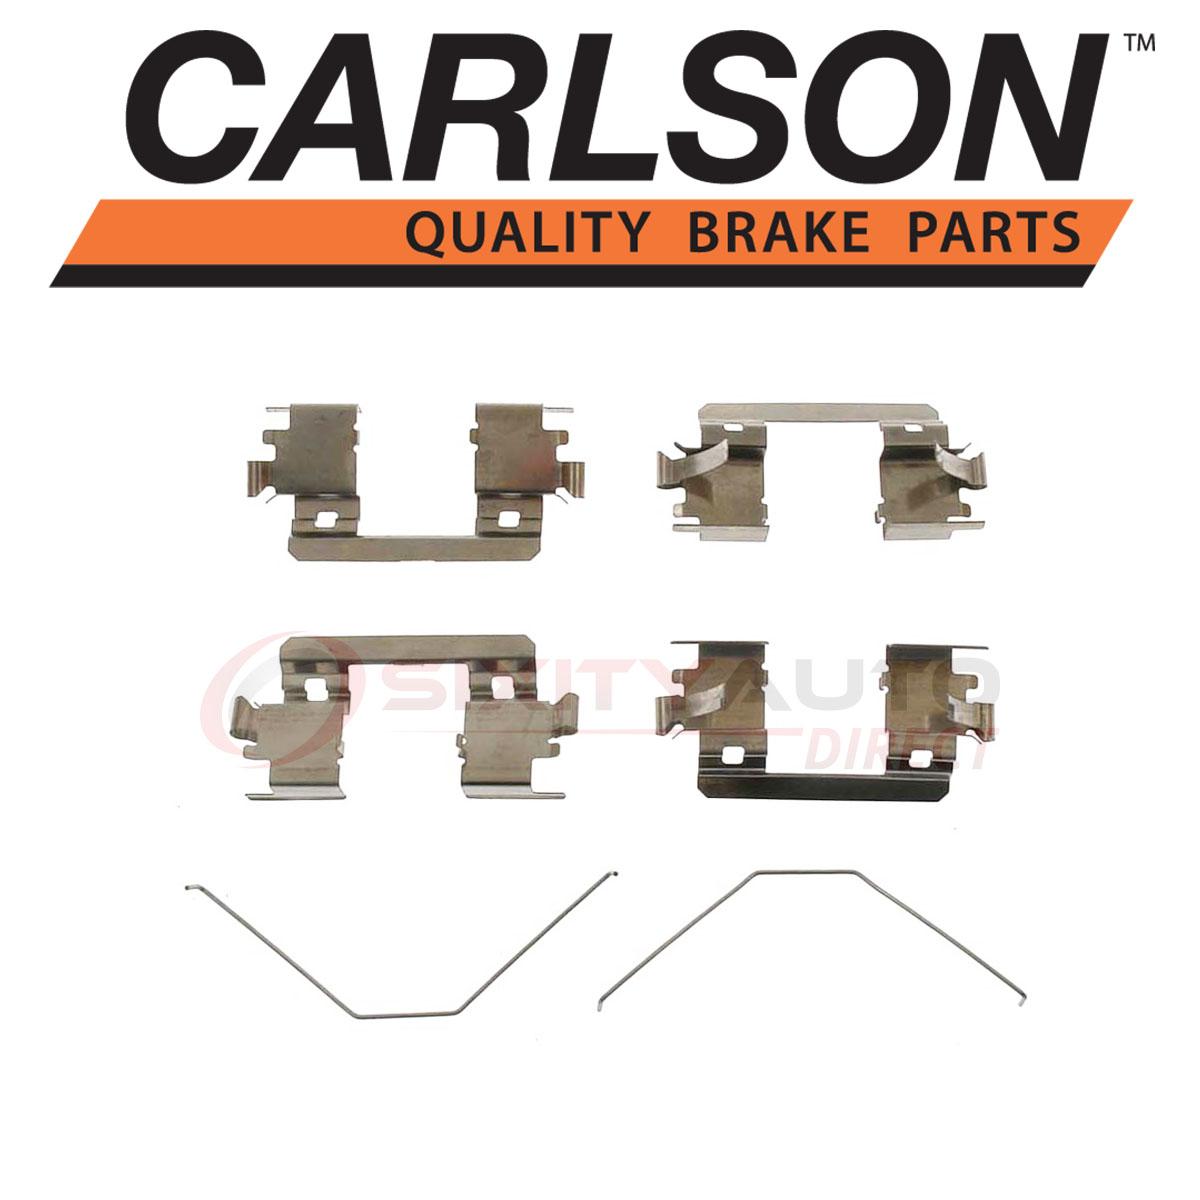 Carlson Front Disc Brake Hardware Kit For 2013-2018 Acura